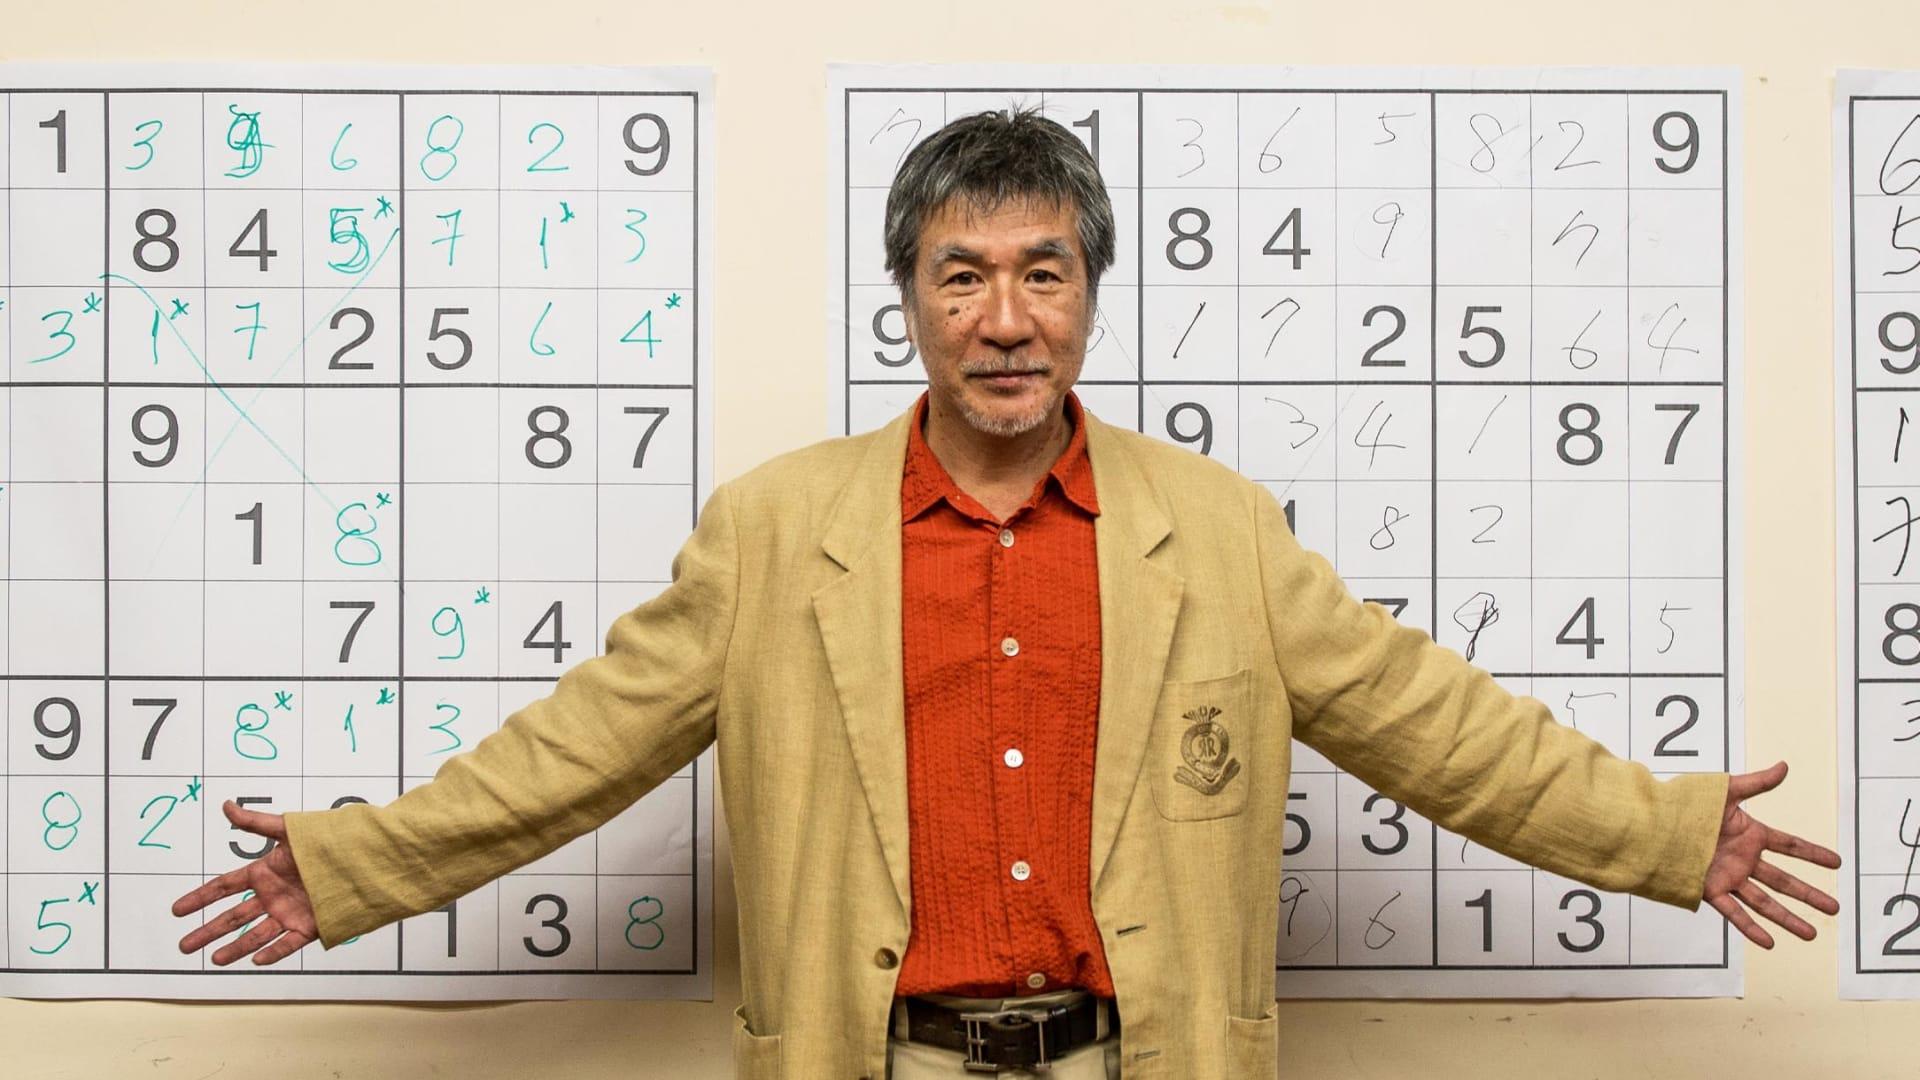 Maki Kaji during the Sudoku first national competition in Sao Paulo, Brazil, on September 29, 2012.